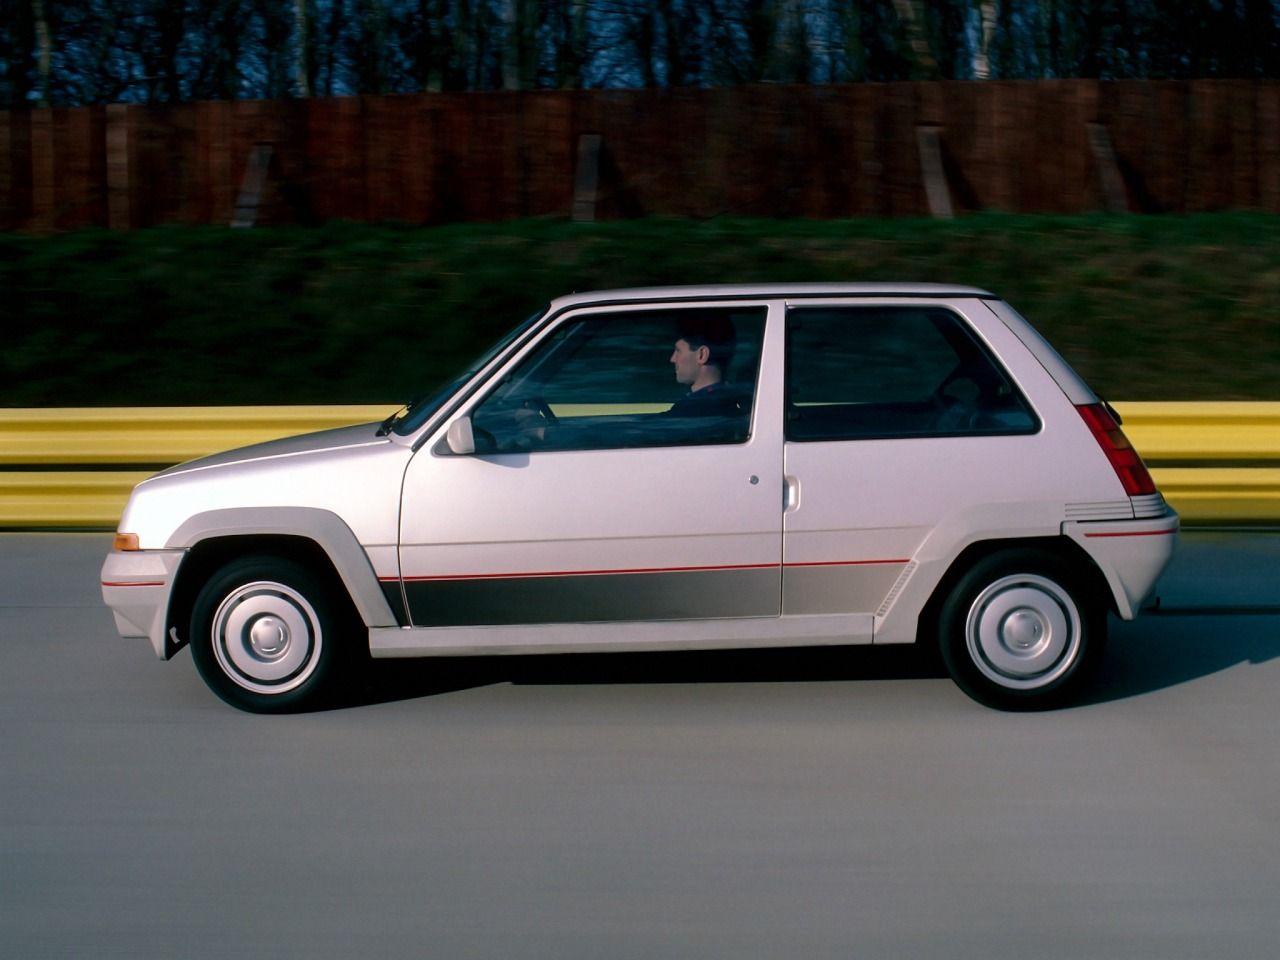 Renault 5 Gt Turbo Renault 5 Gt Turbo Renault 5 Renault